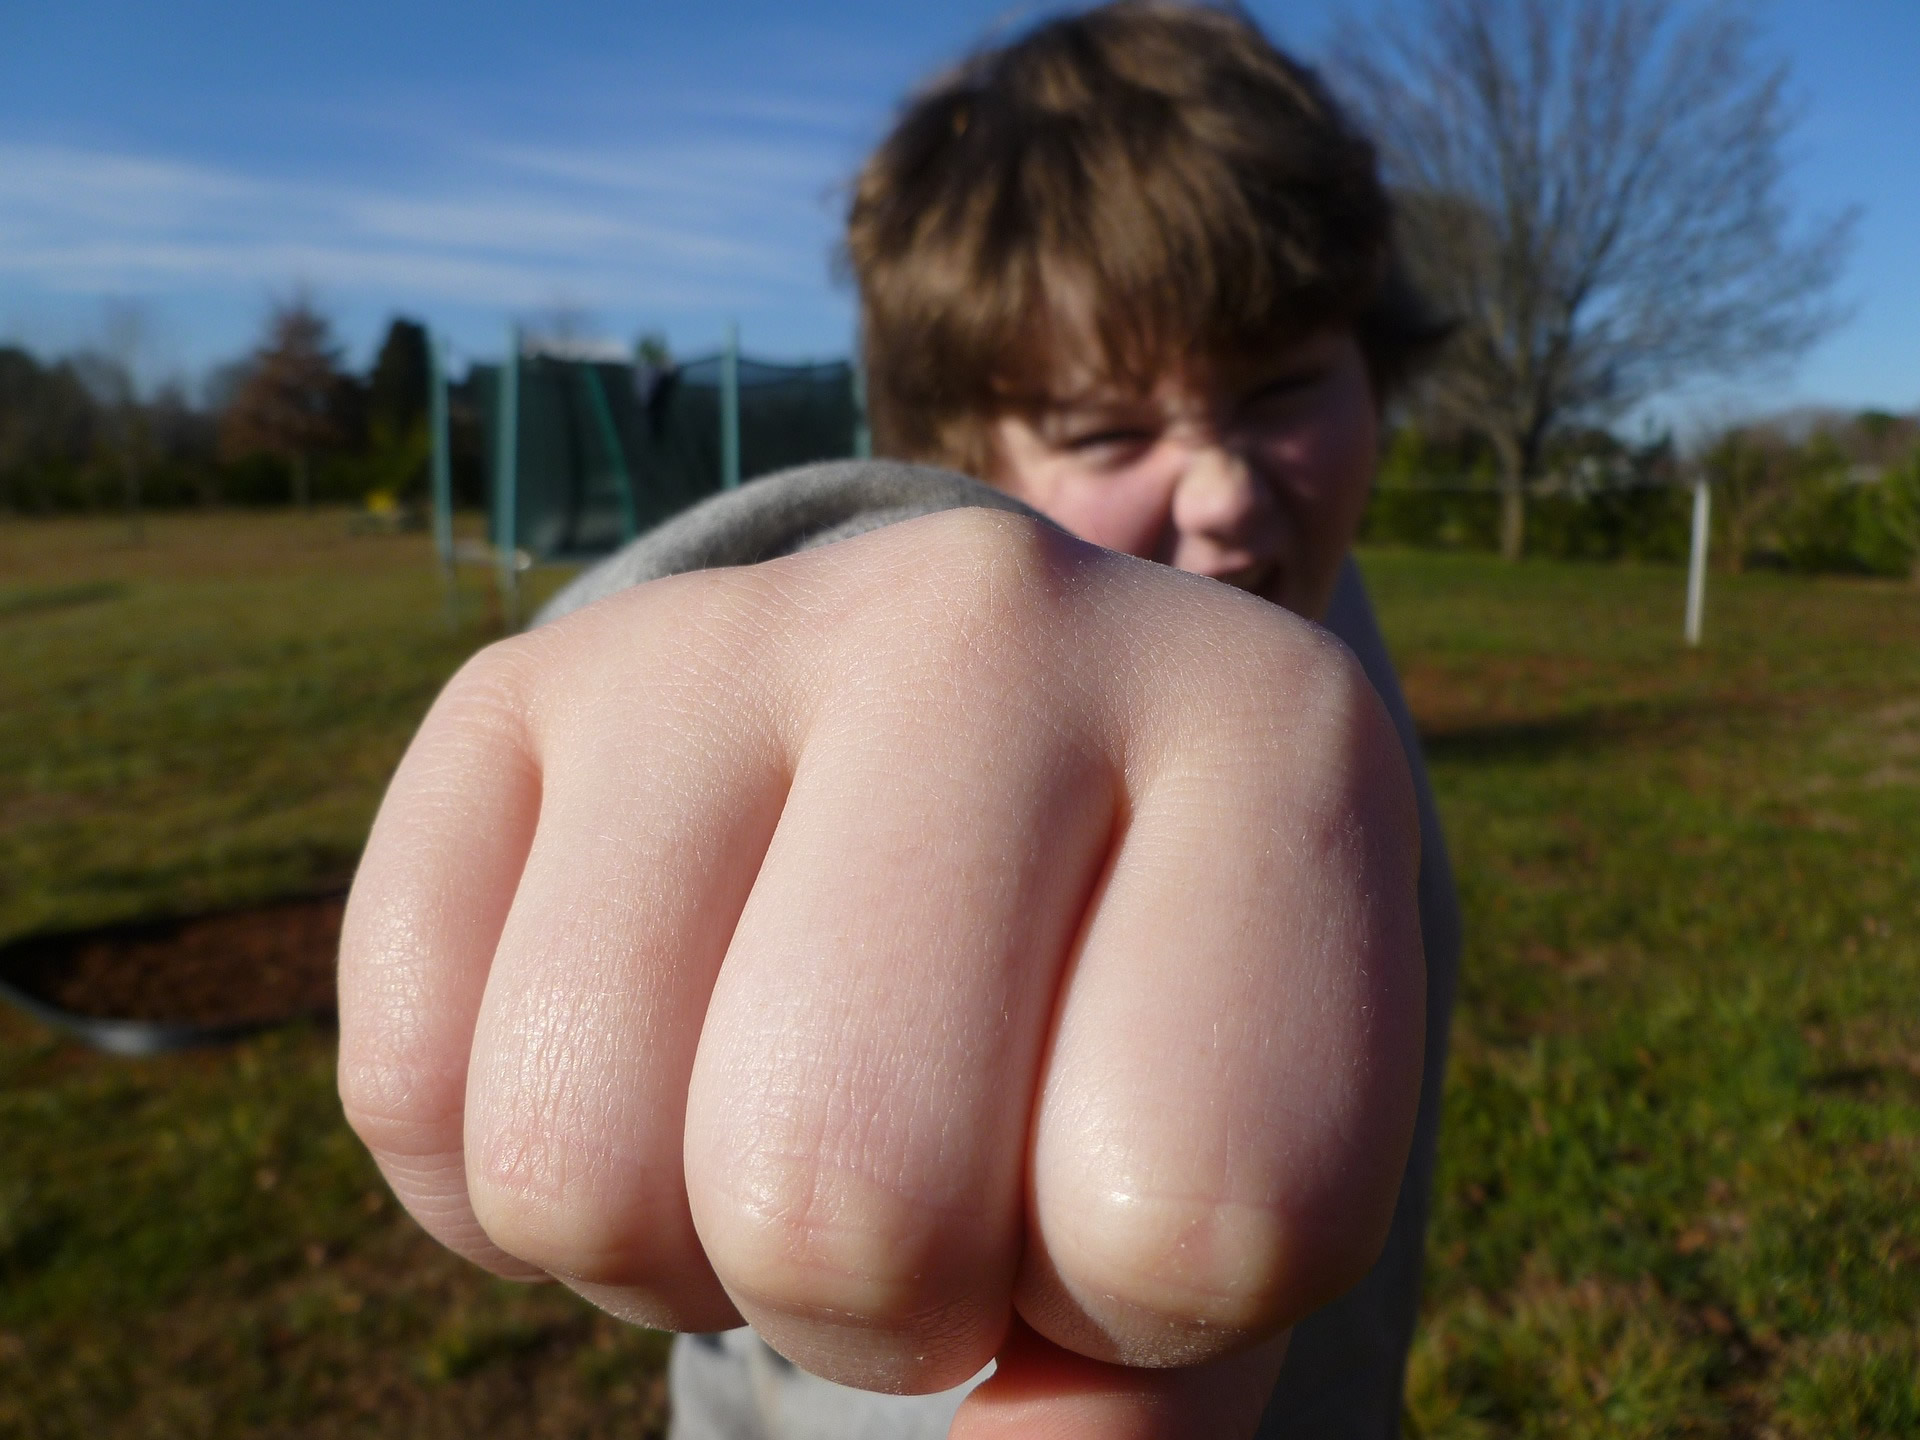 aggressive-boy.jpg